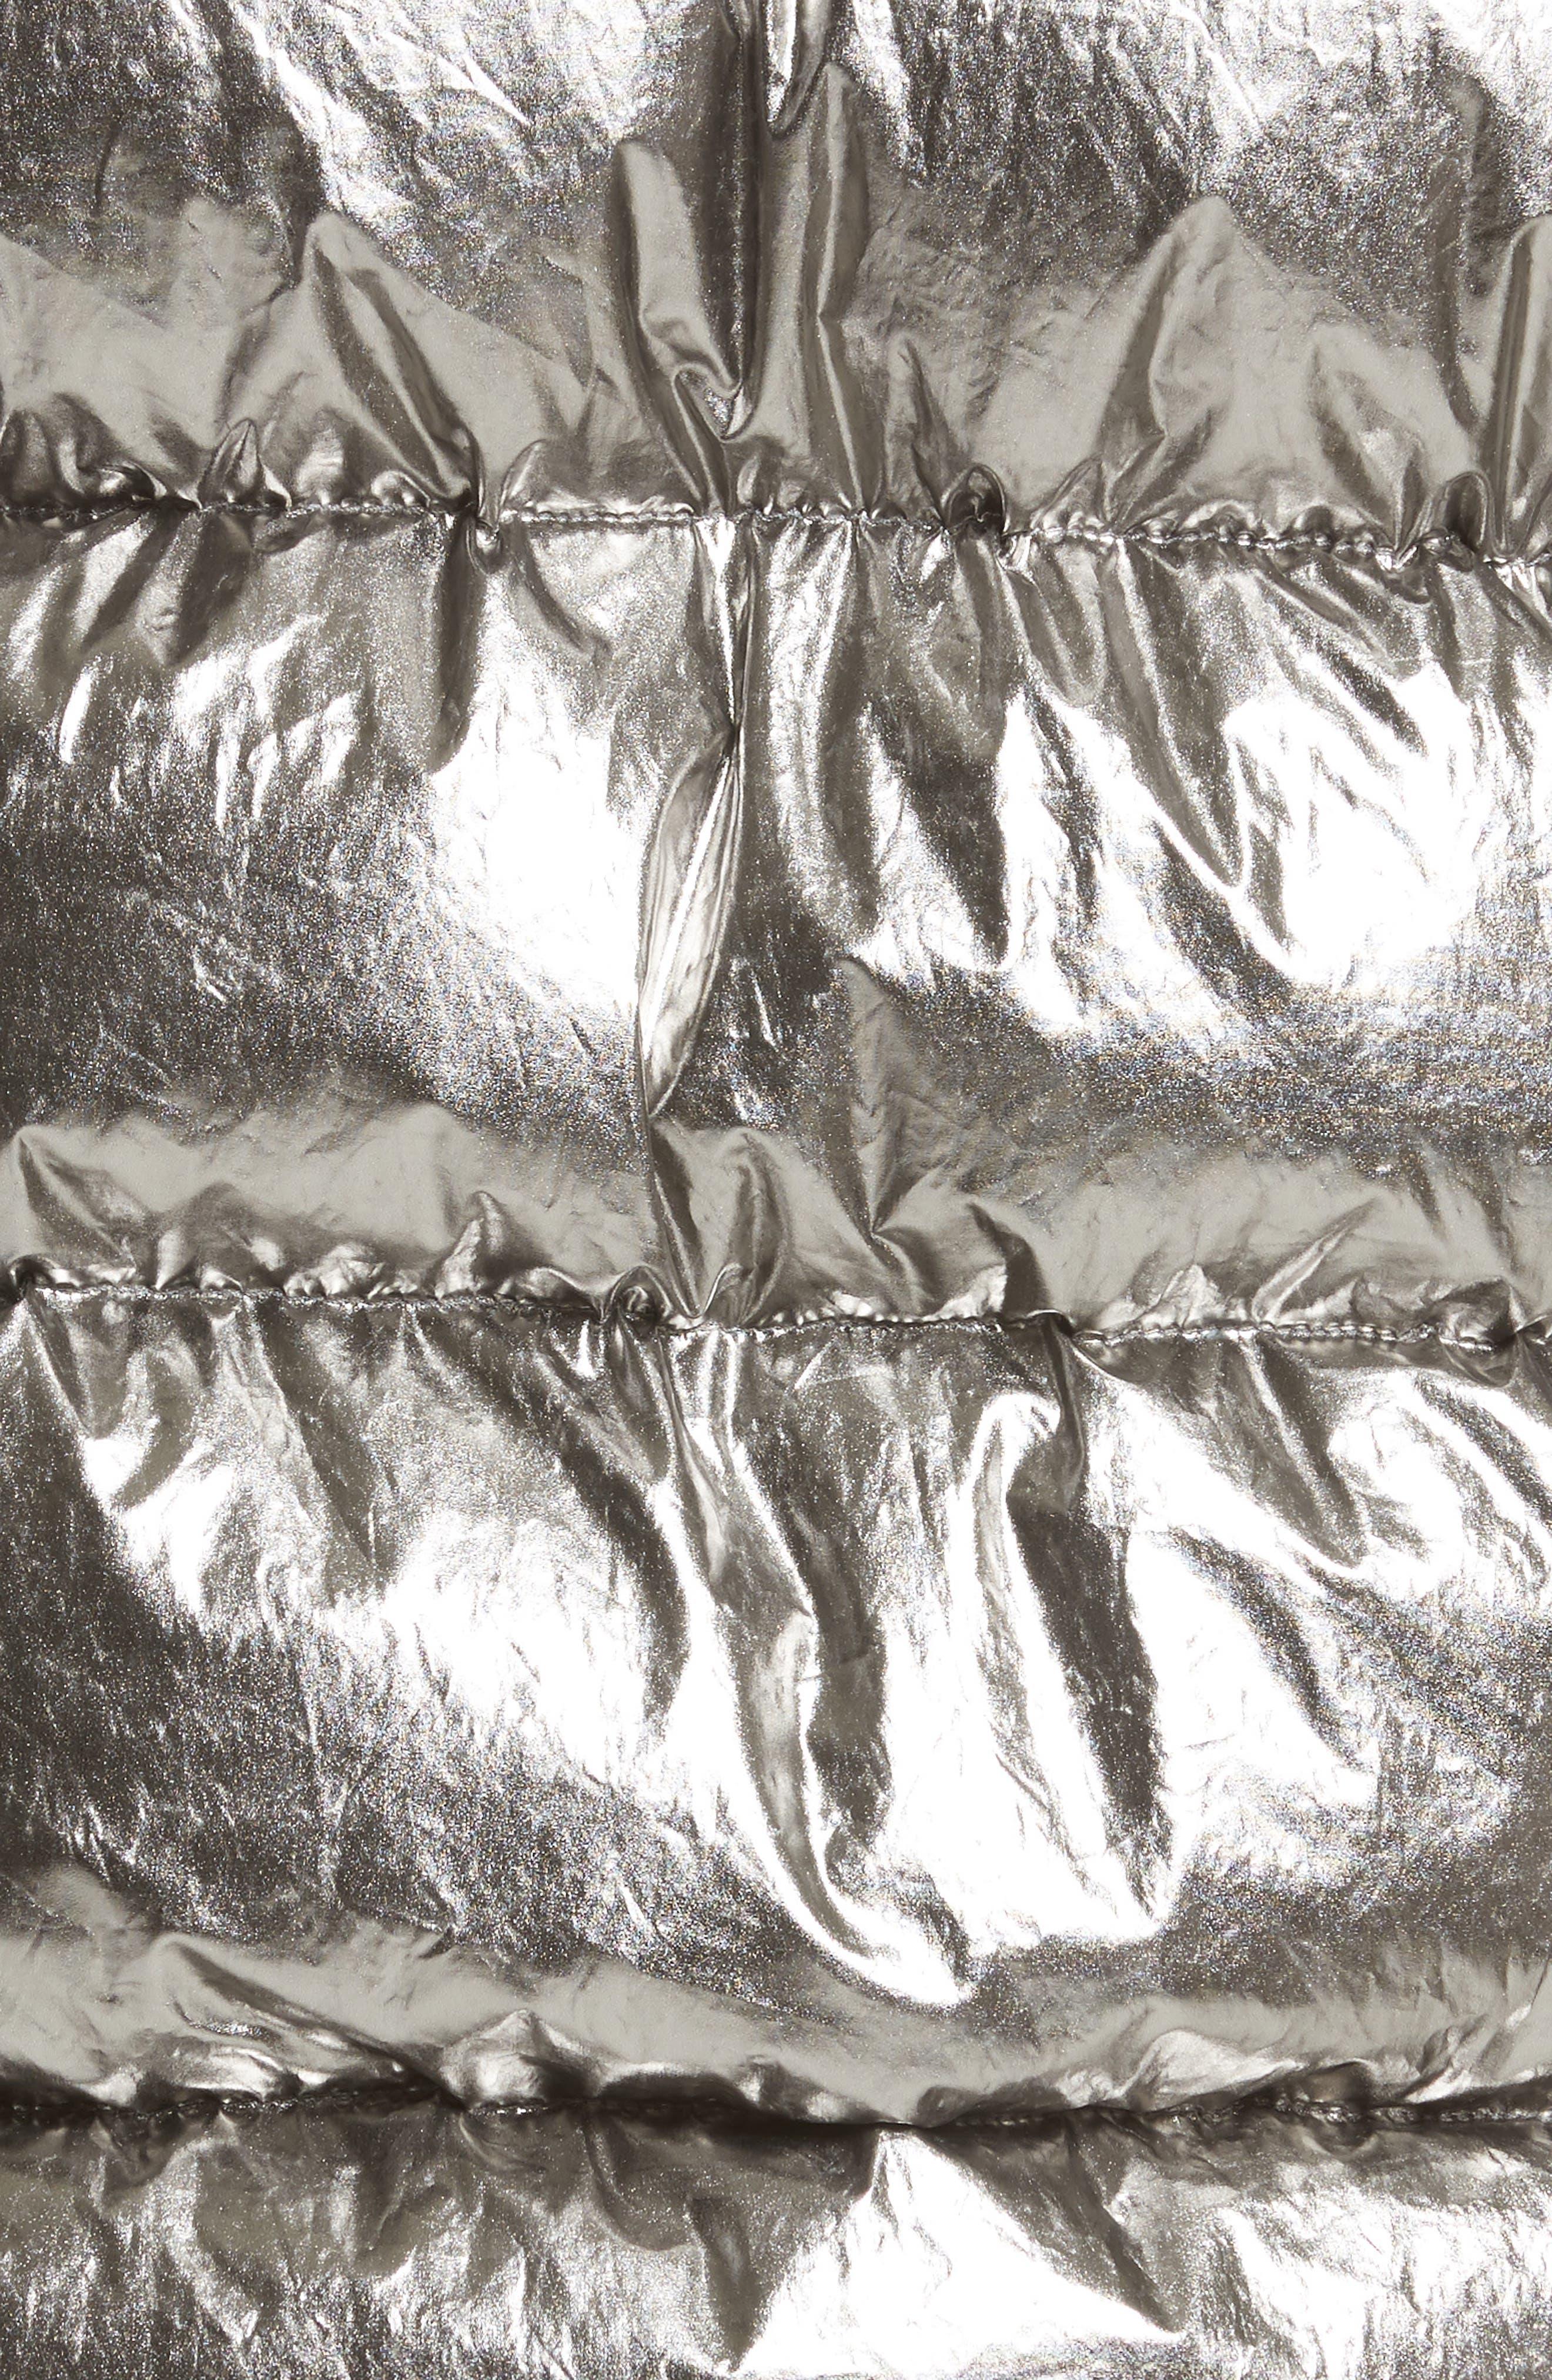 Kerria Metallic Down Vest with Genuine Shearling Trim,                             Alternate thumbnail 6, color,                             040